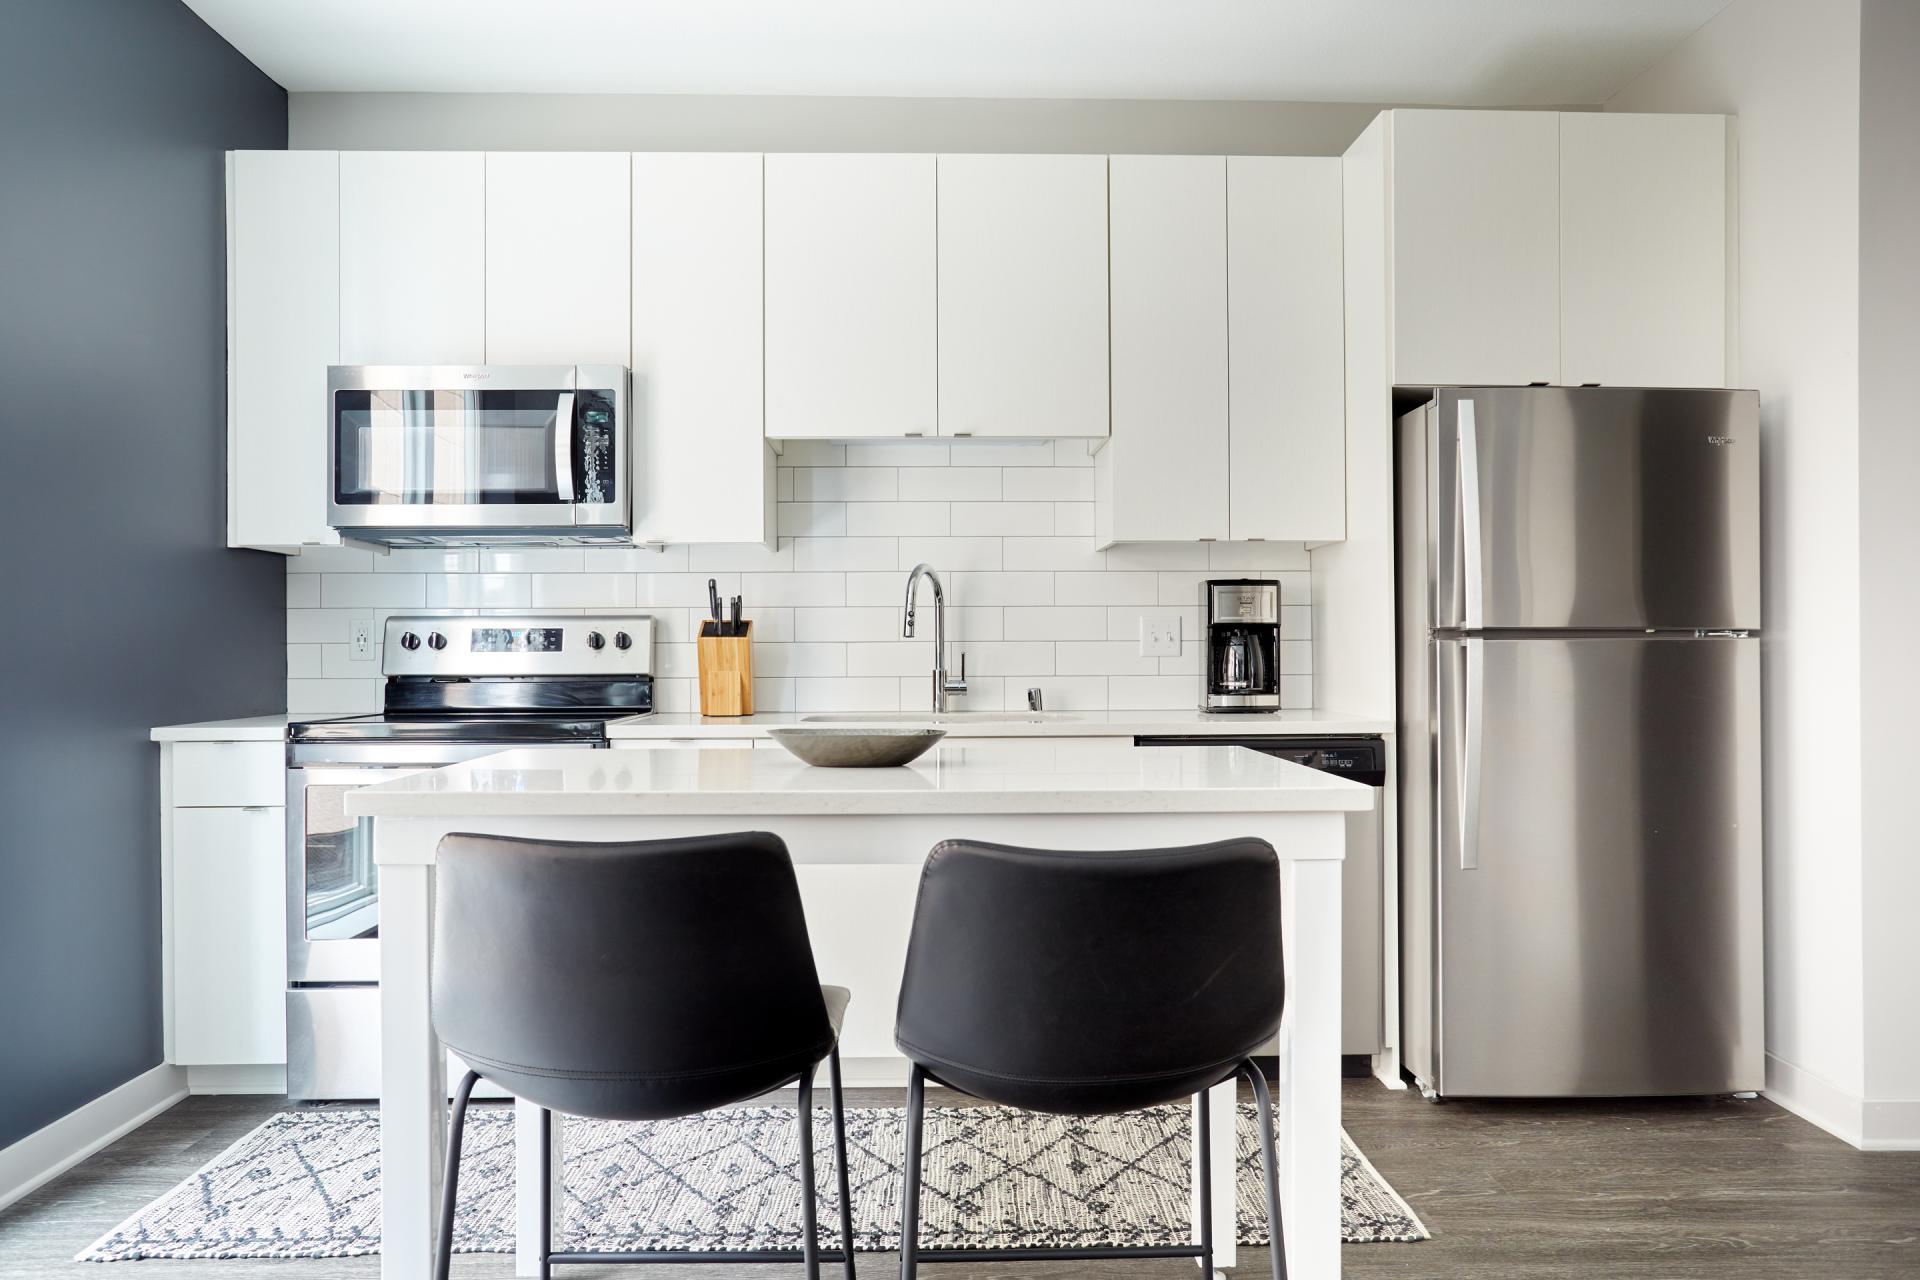 Kitchen at Luna Apartment, Cedar-Riverside, Minneapolis